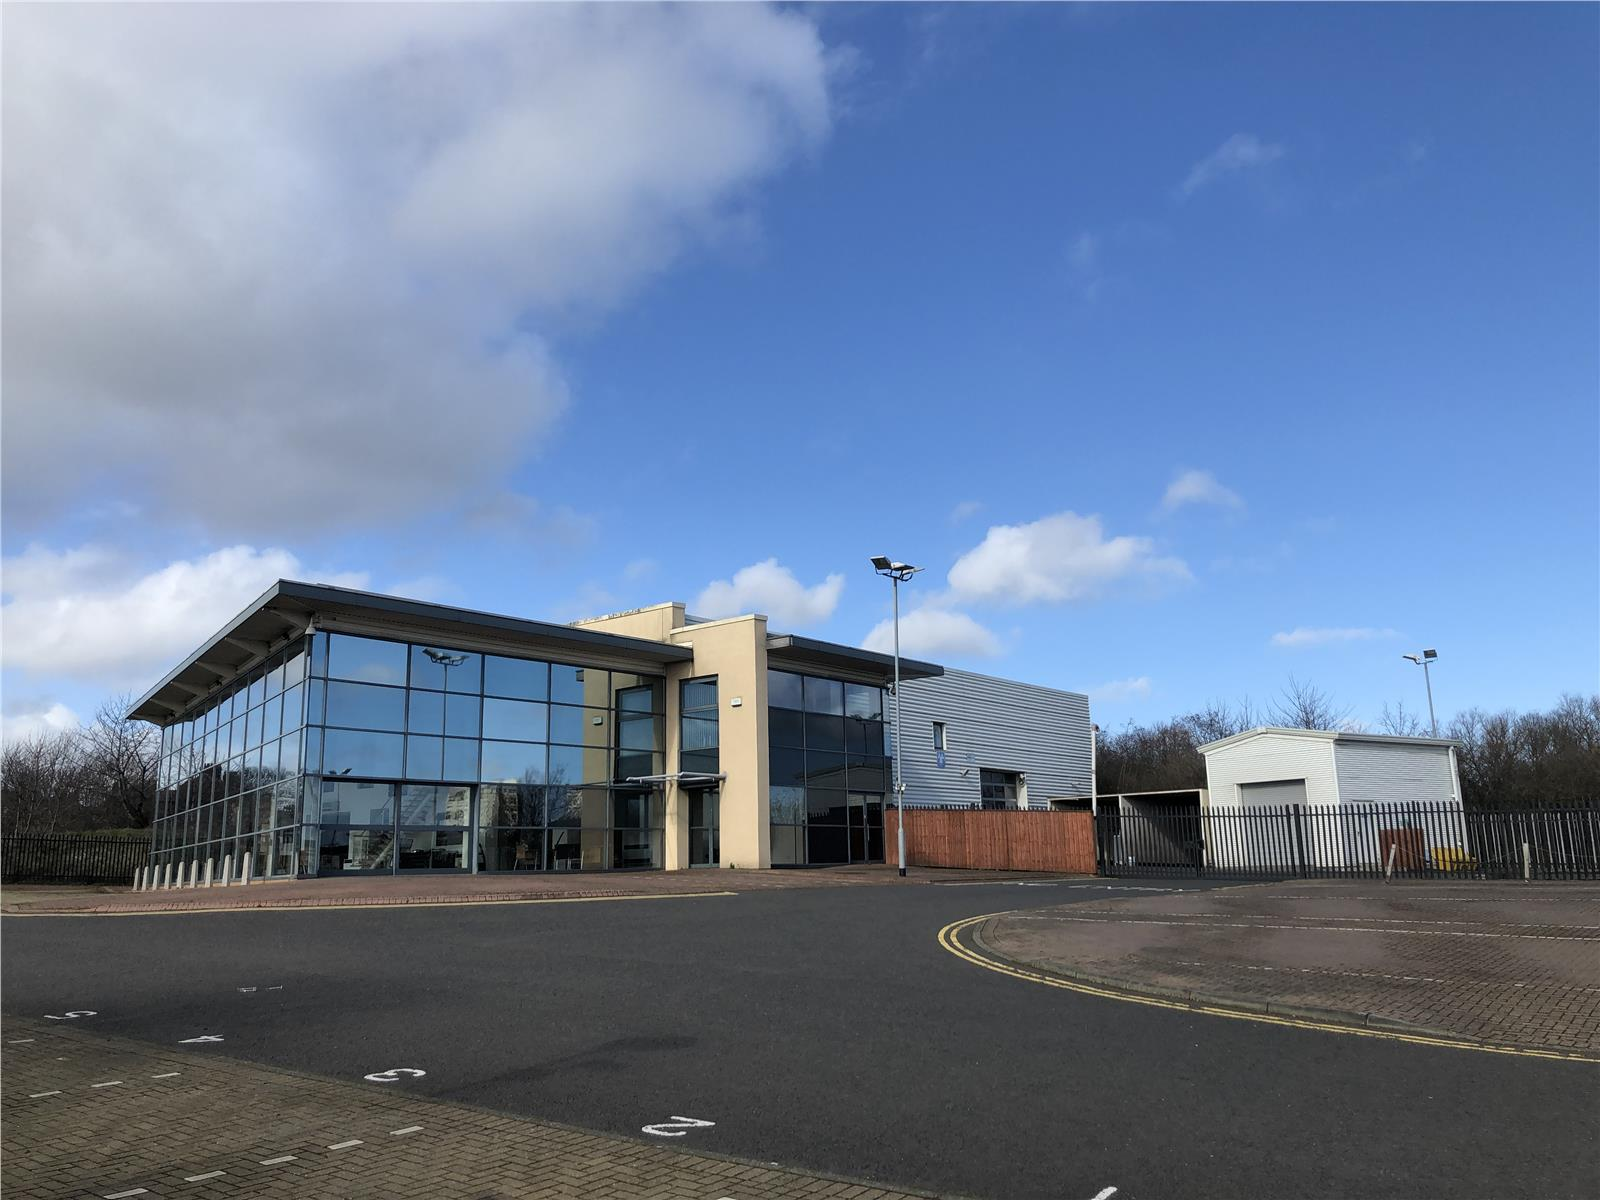 244-246 Stamfordham Road, Newcastle Upon Tyne, Tyne And Wear, NE5 2LA